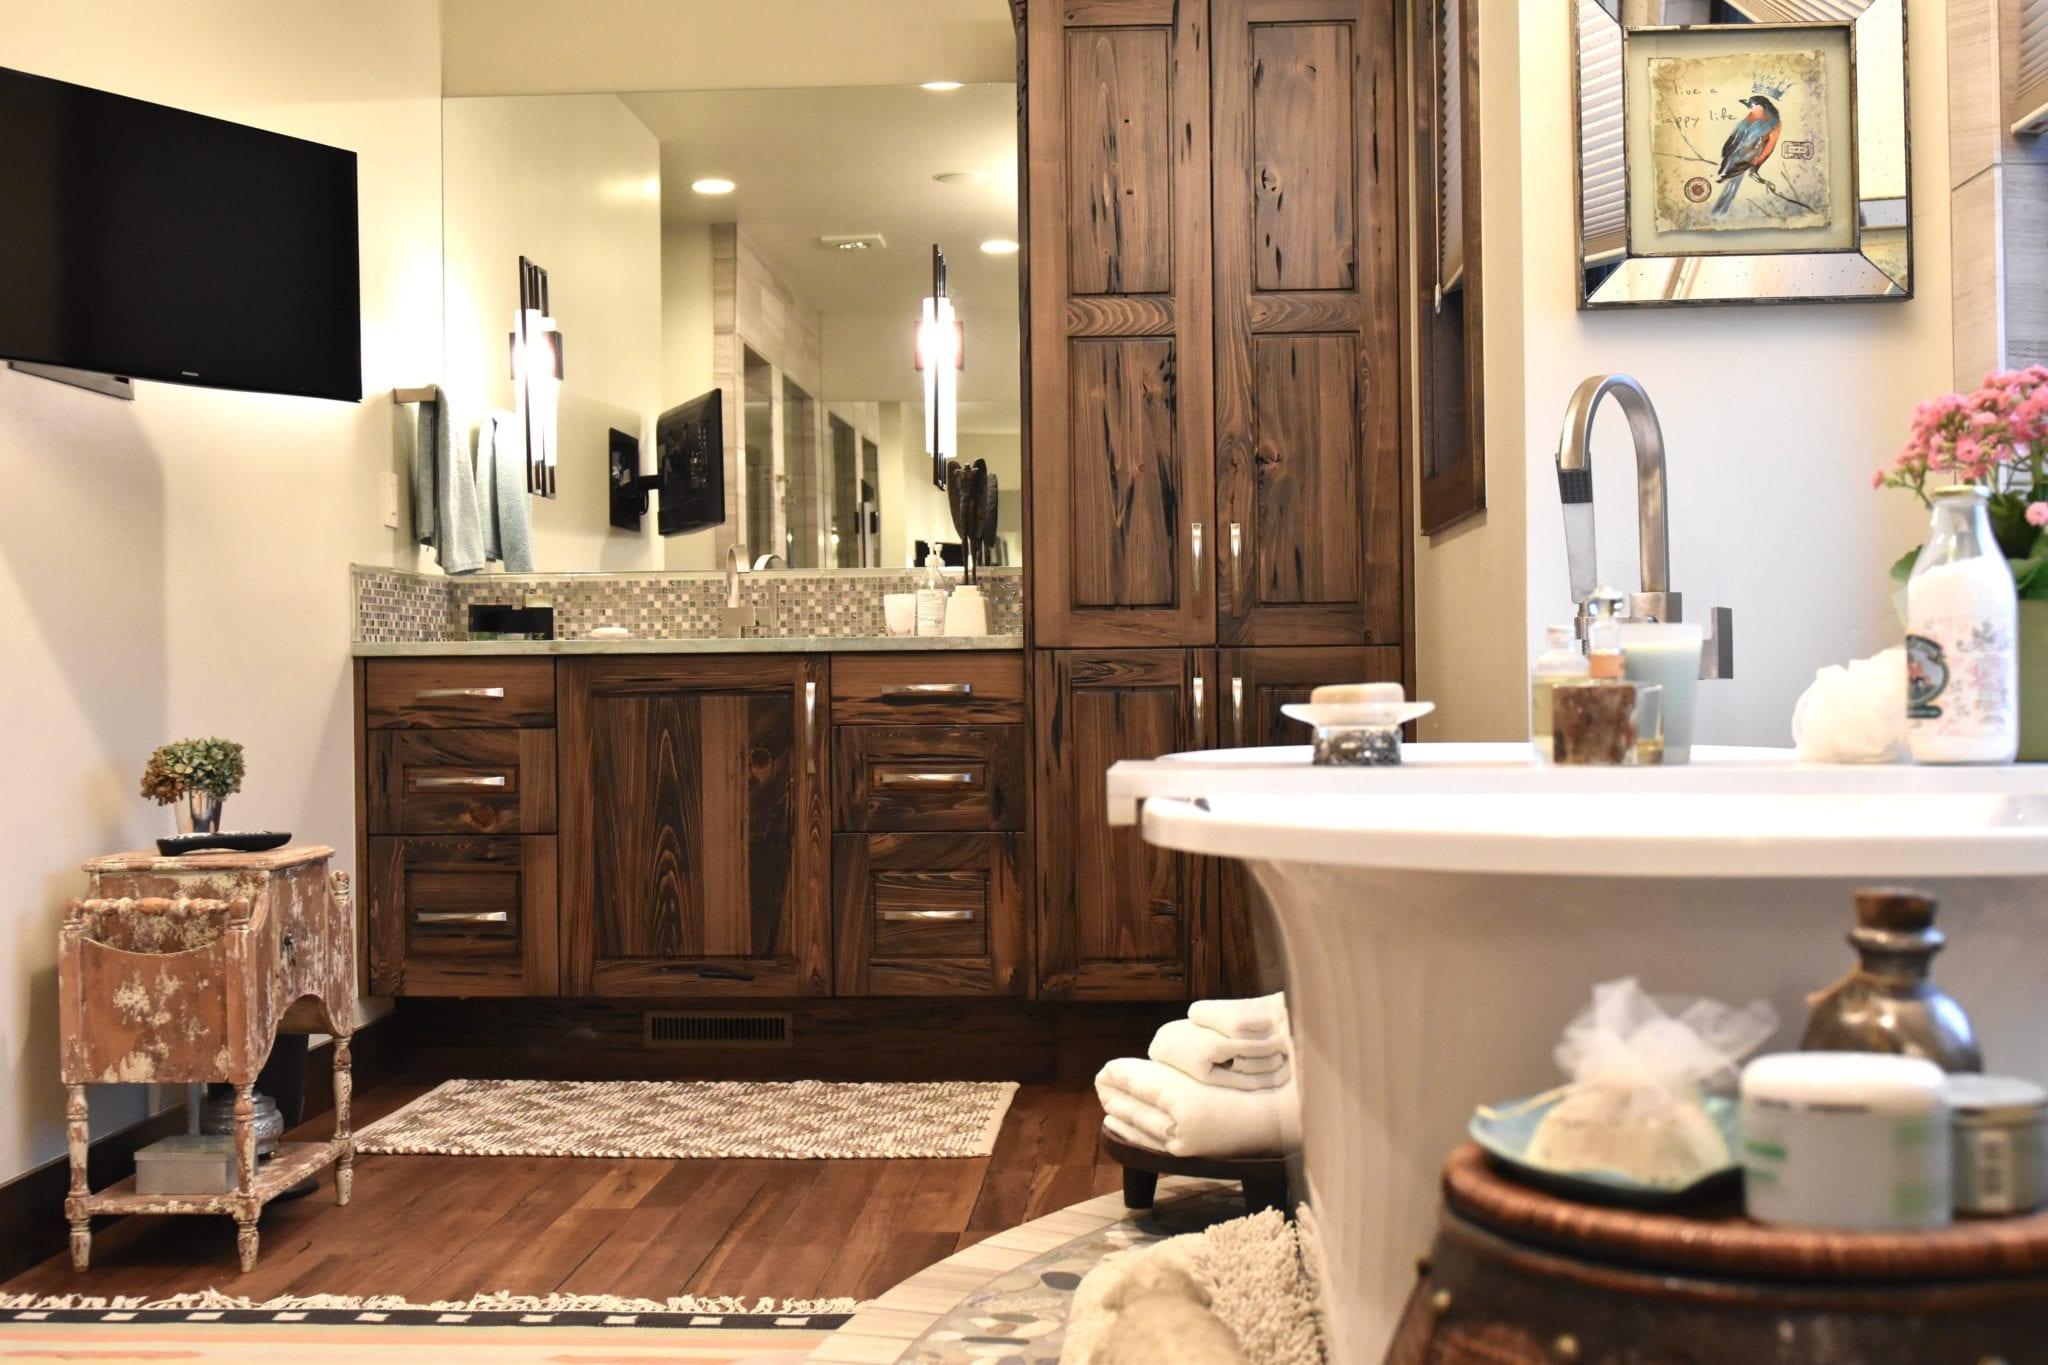 ... Design Your Own Bathroom, Rustic Modern Mountain Bathroom, How To  Design ...